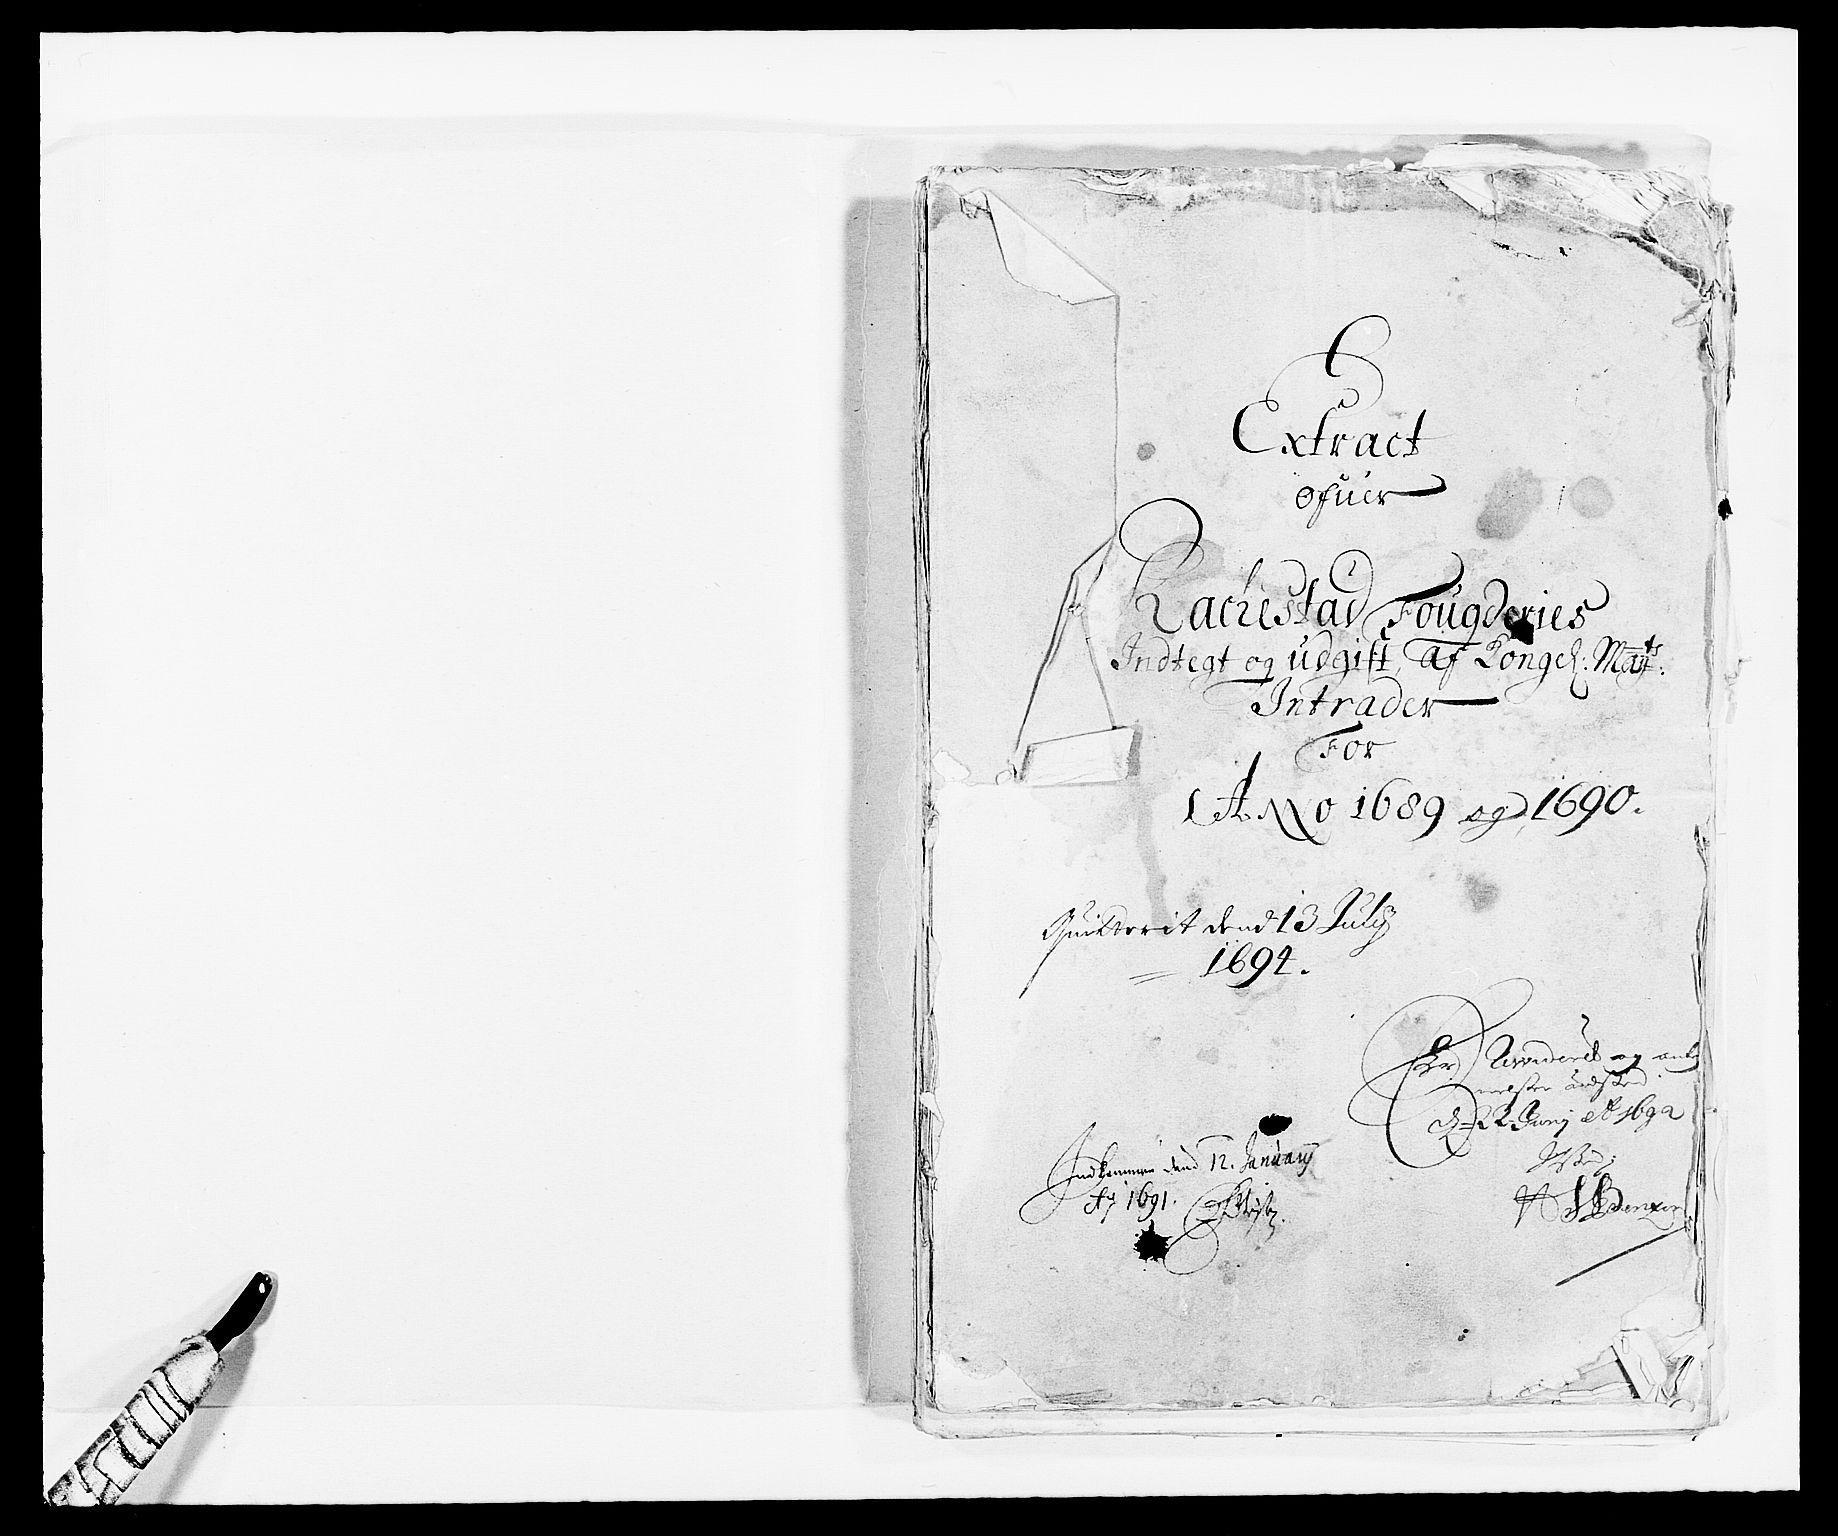 RA, Rentekammeret inntil 1814, Reviderte regnskaper, Fogderegnskap, R05/L0277: Fogderegnskap Rakkestad, 1689-1690, s. 304